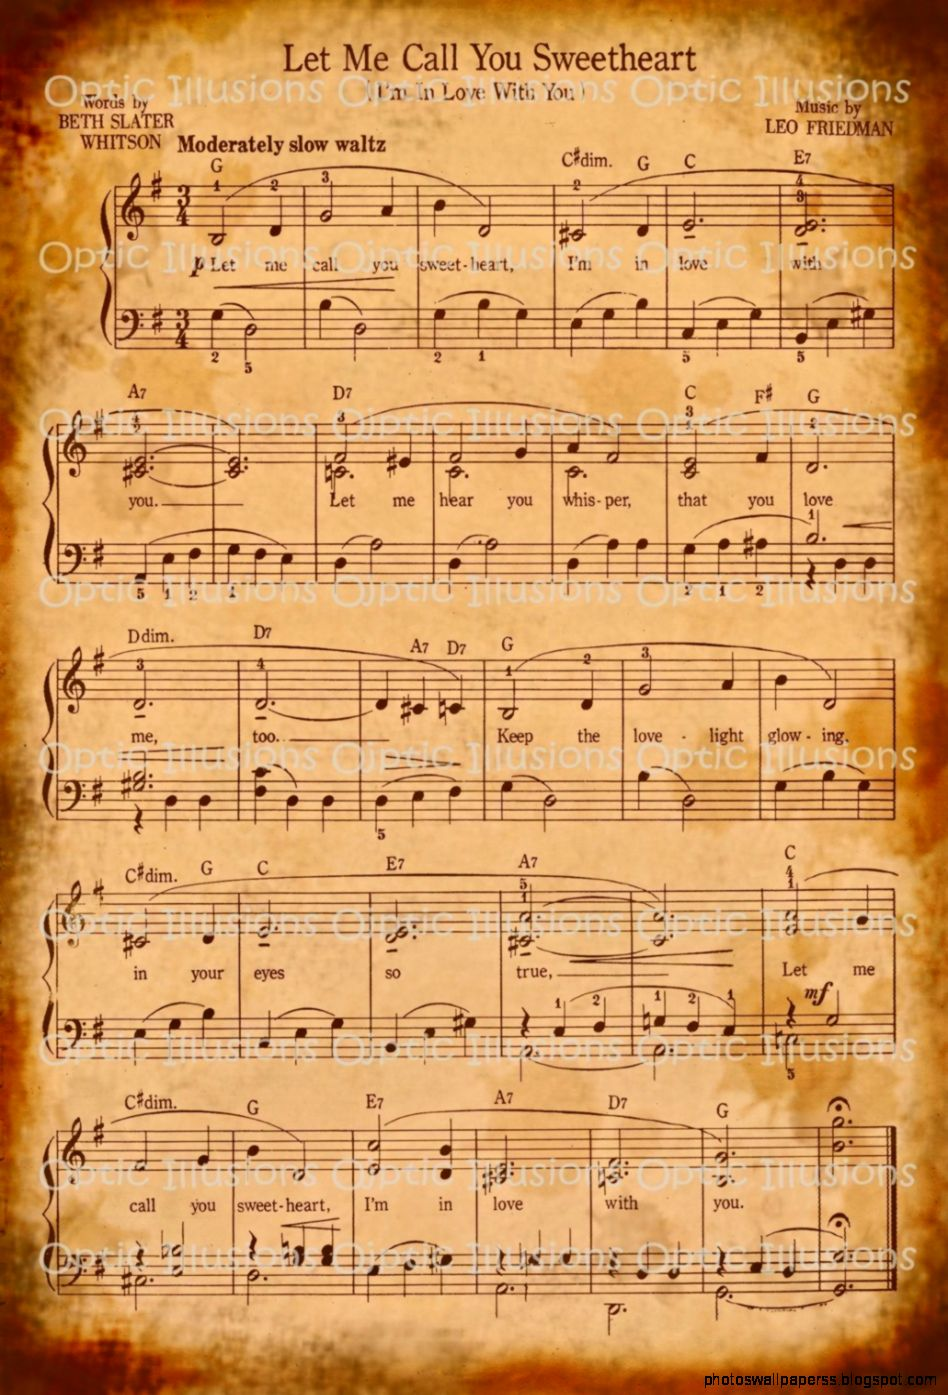 Sheet Music Desktop Wallpaper   www.imgkid.com - The Image ...